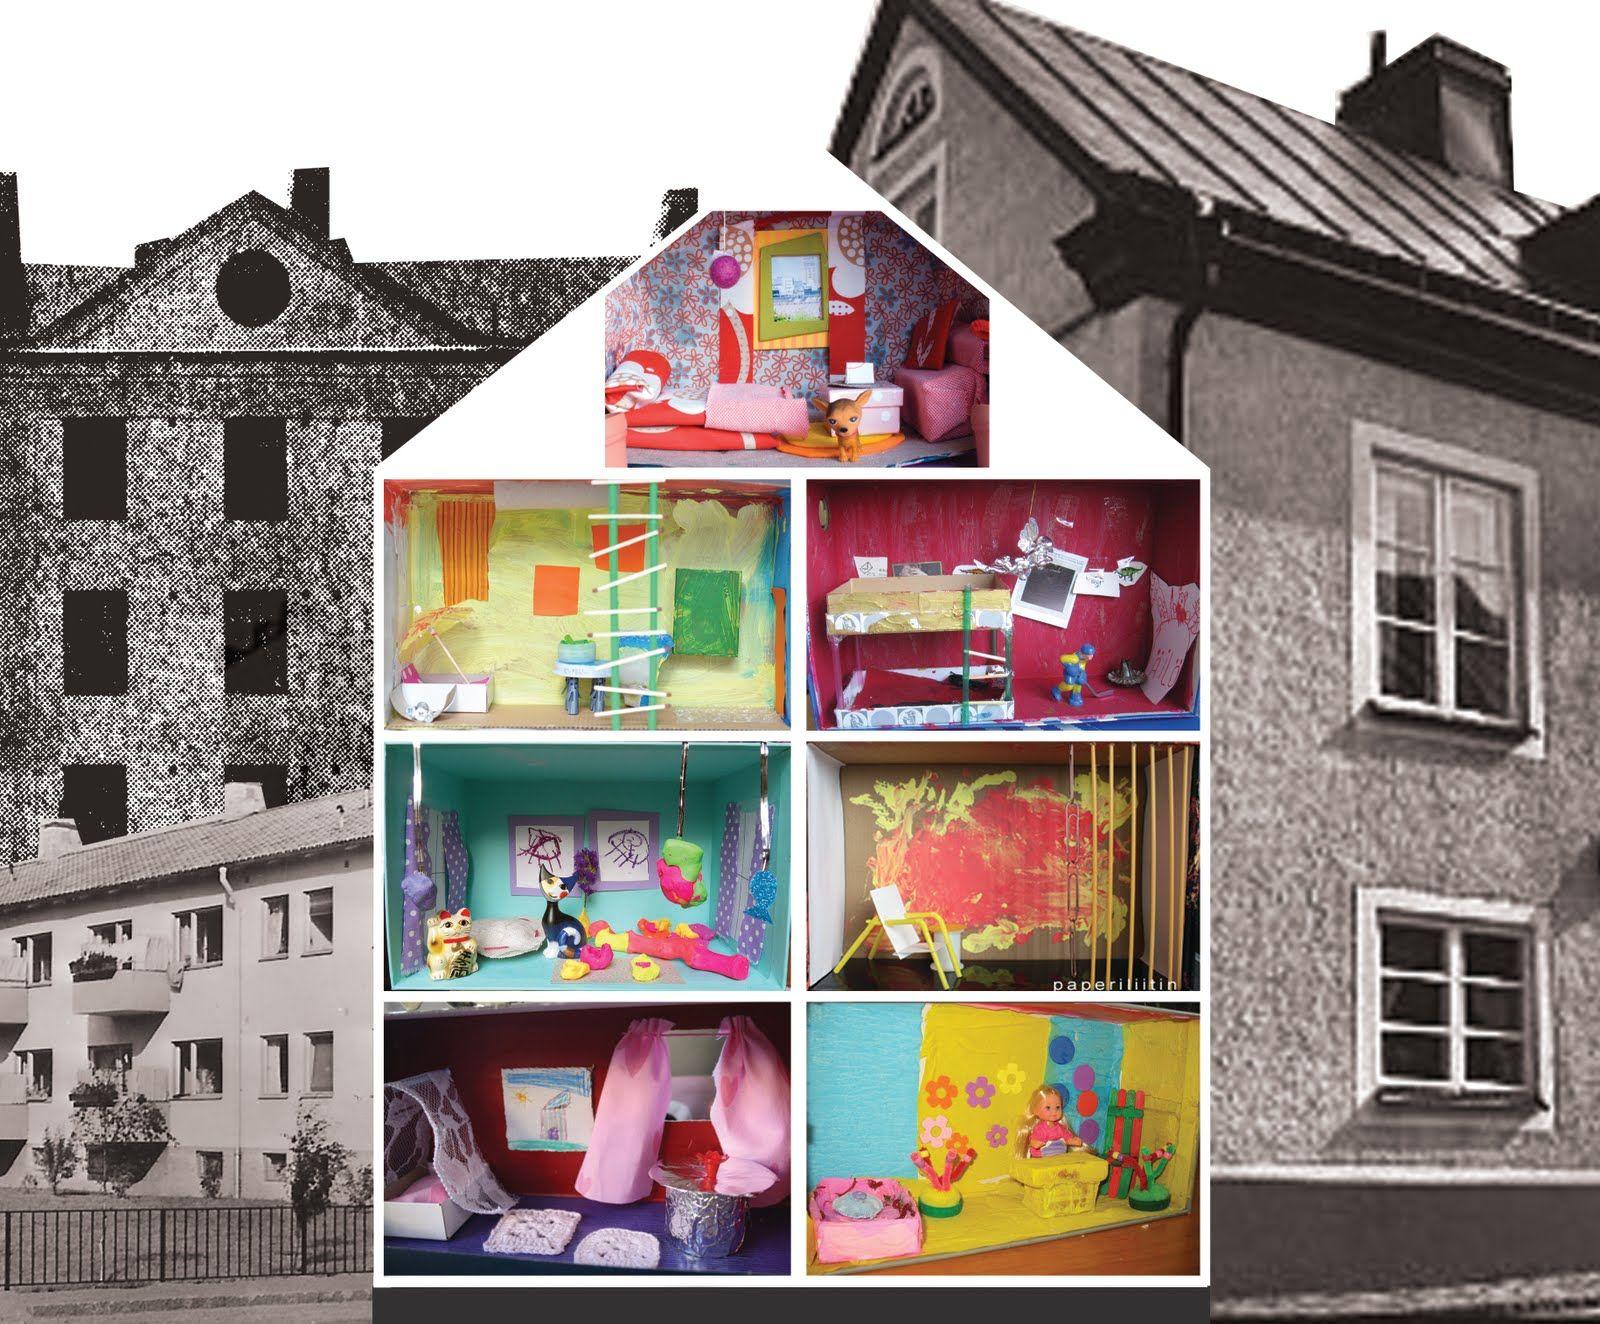 Shoebox Dollhouse Schoenendoos Knutselen Kids Crafts Knutselideeen